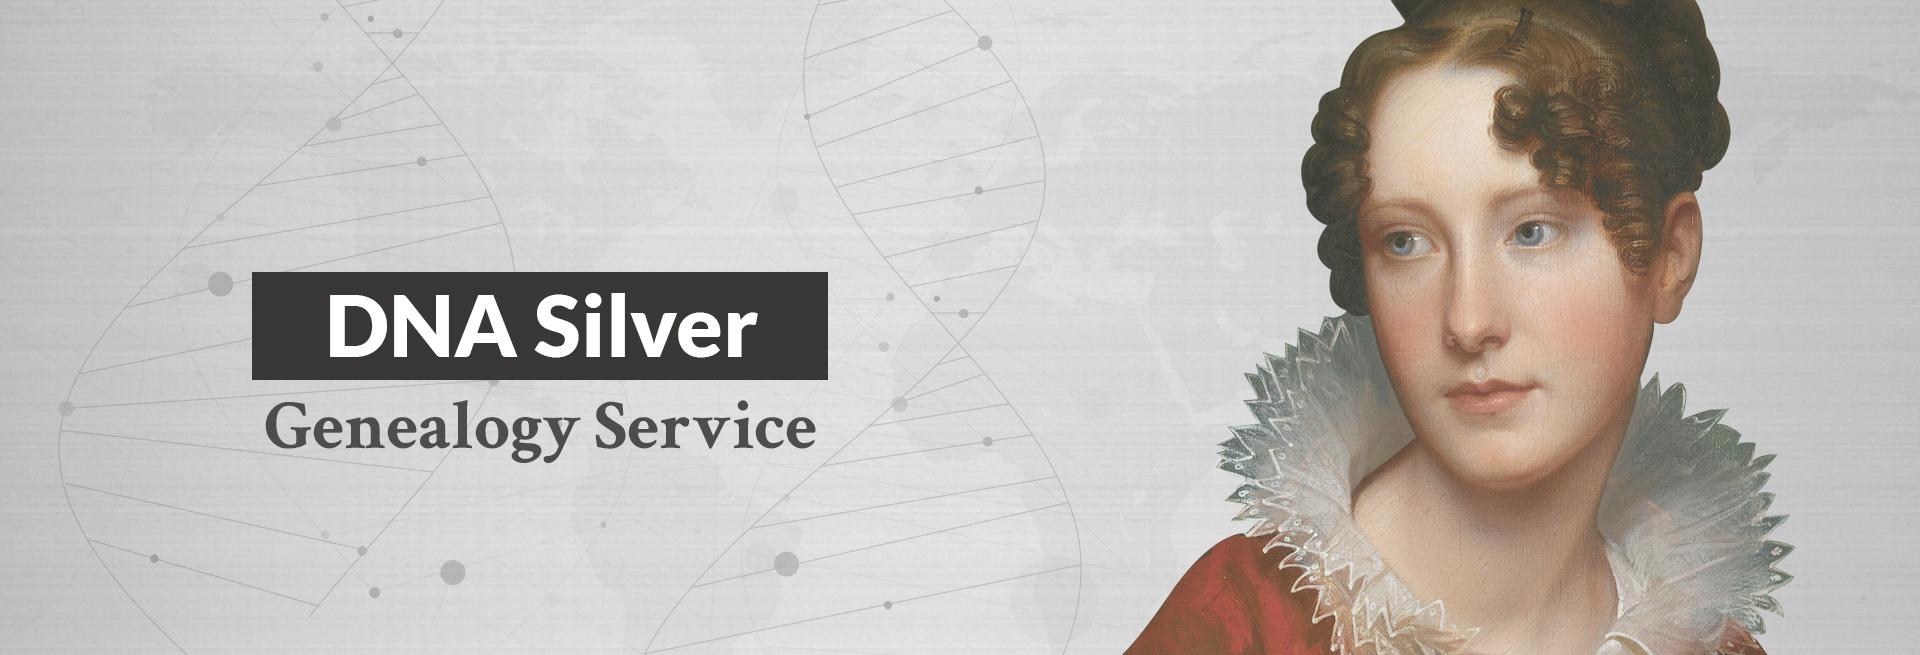 DNA Silver Genealogy Service